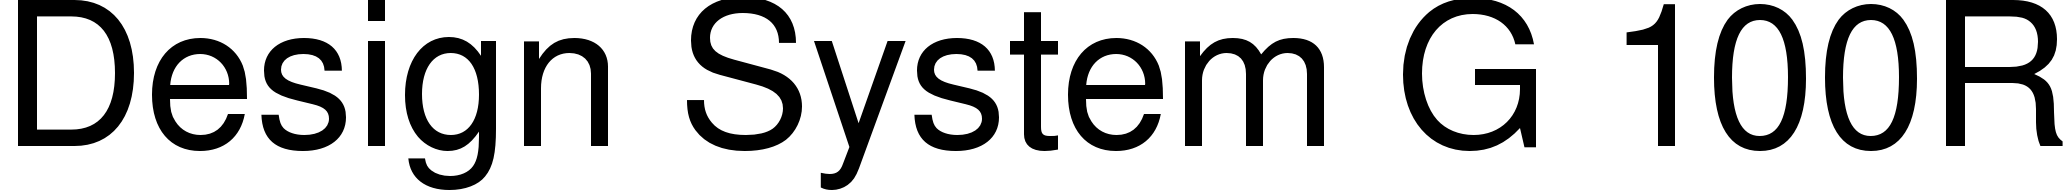 Design System G 100R